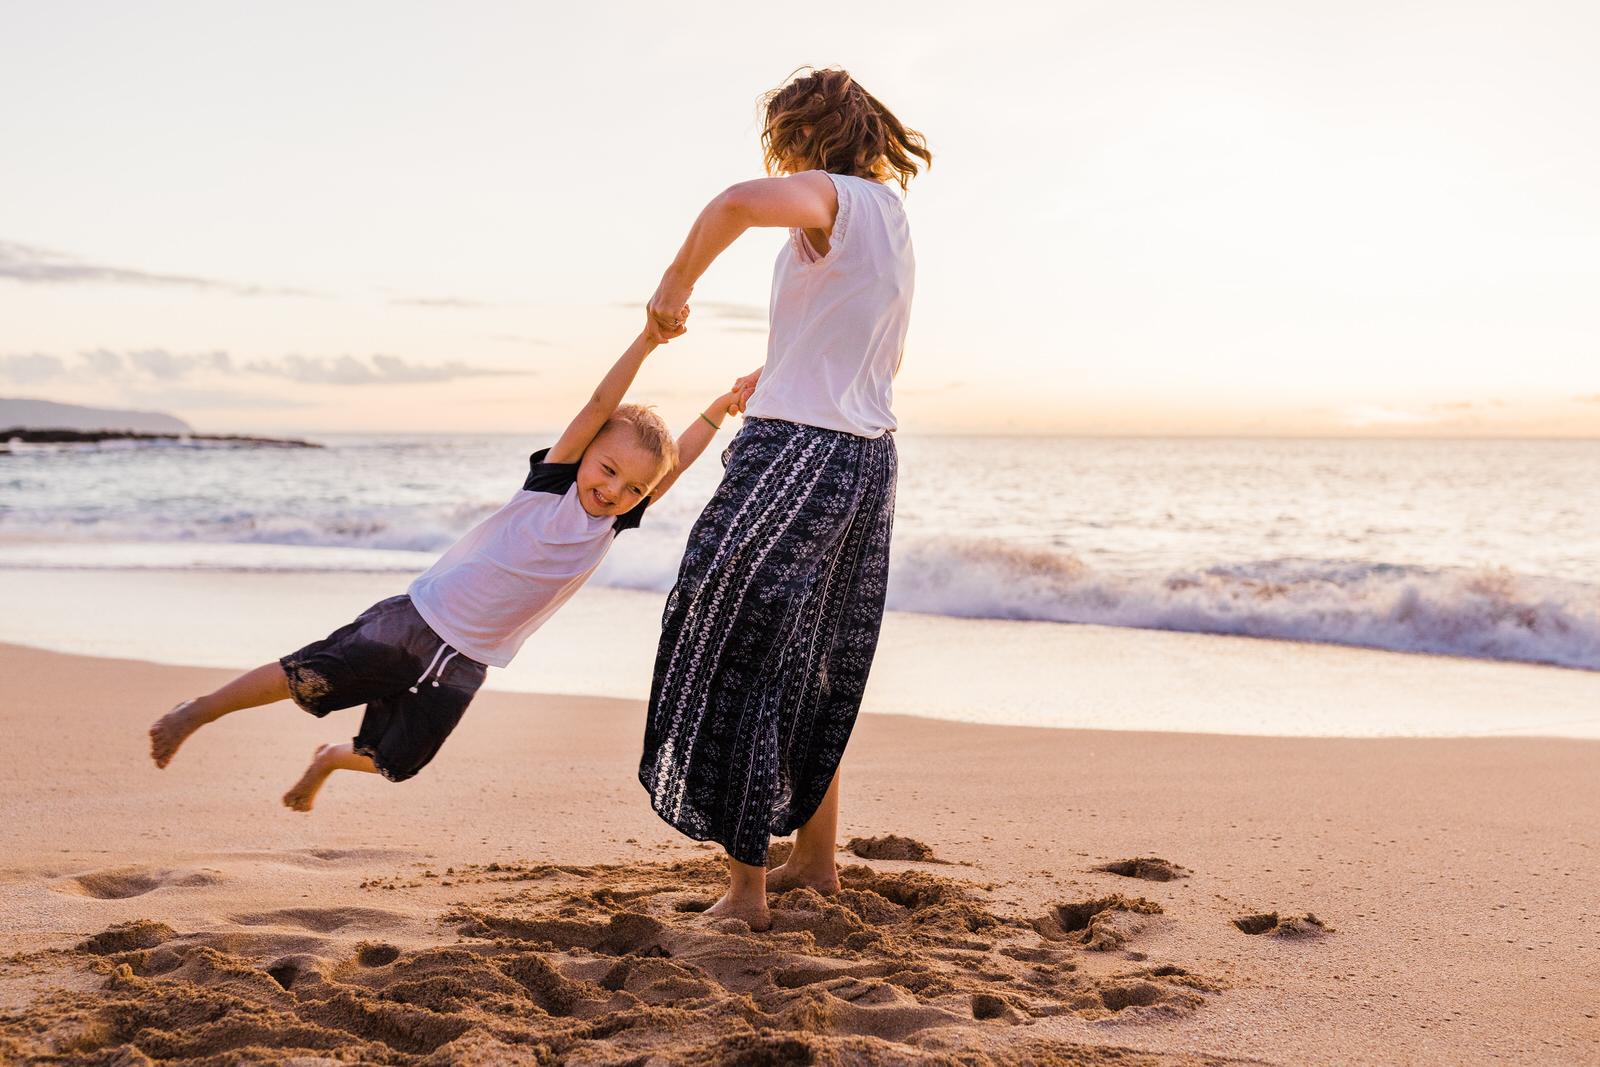 extended-family-big-island-vacation-cousins-grandparents-beach-waikoloa-sunset-hawaii-7409.jpg